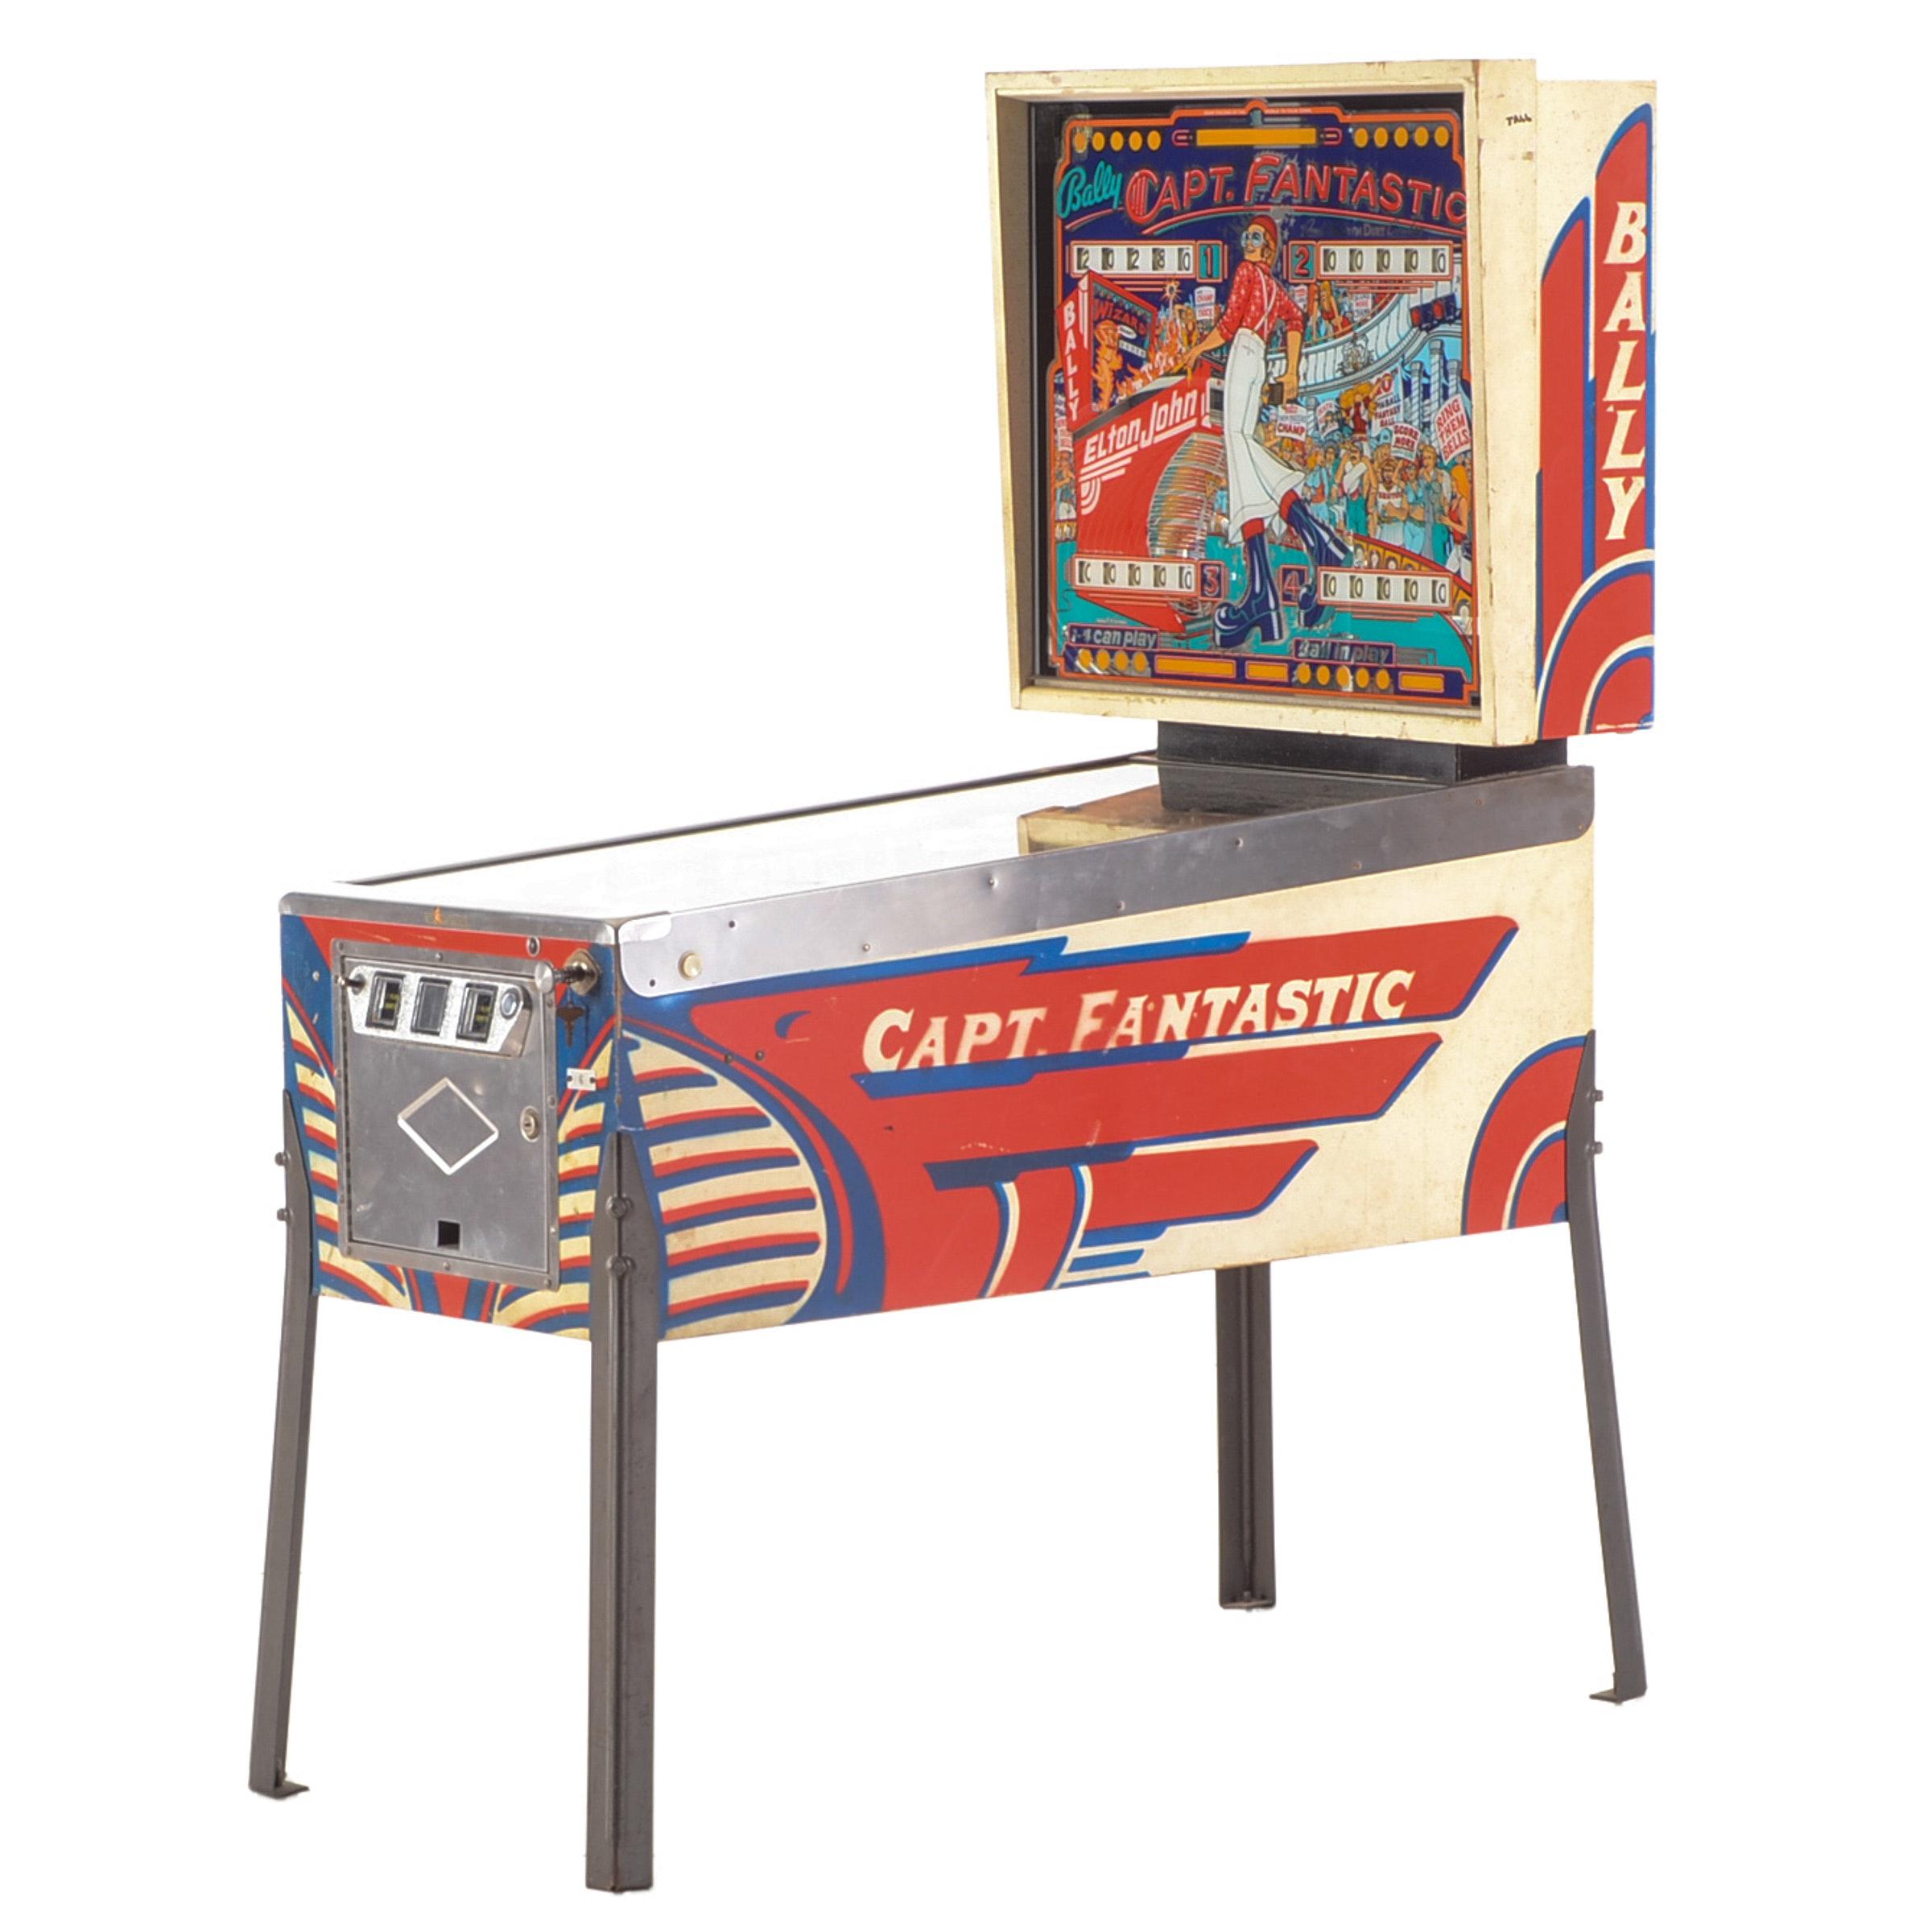 "Elton John ""Captain Fantastic"" Pinball Machine by Bally"